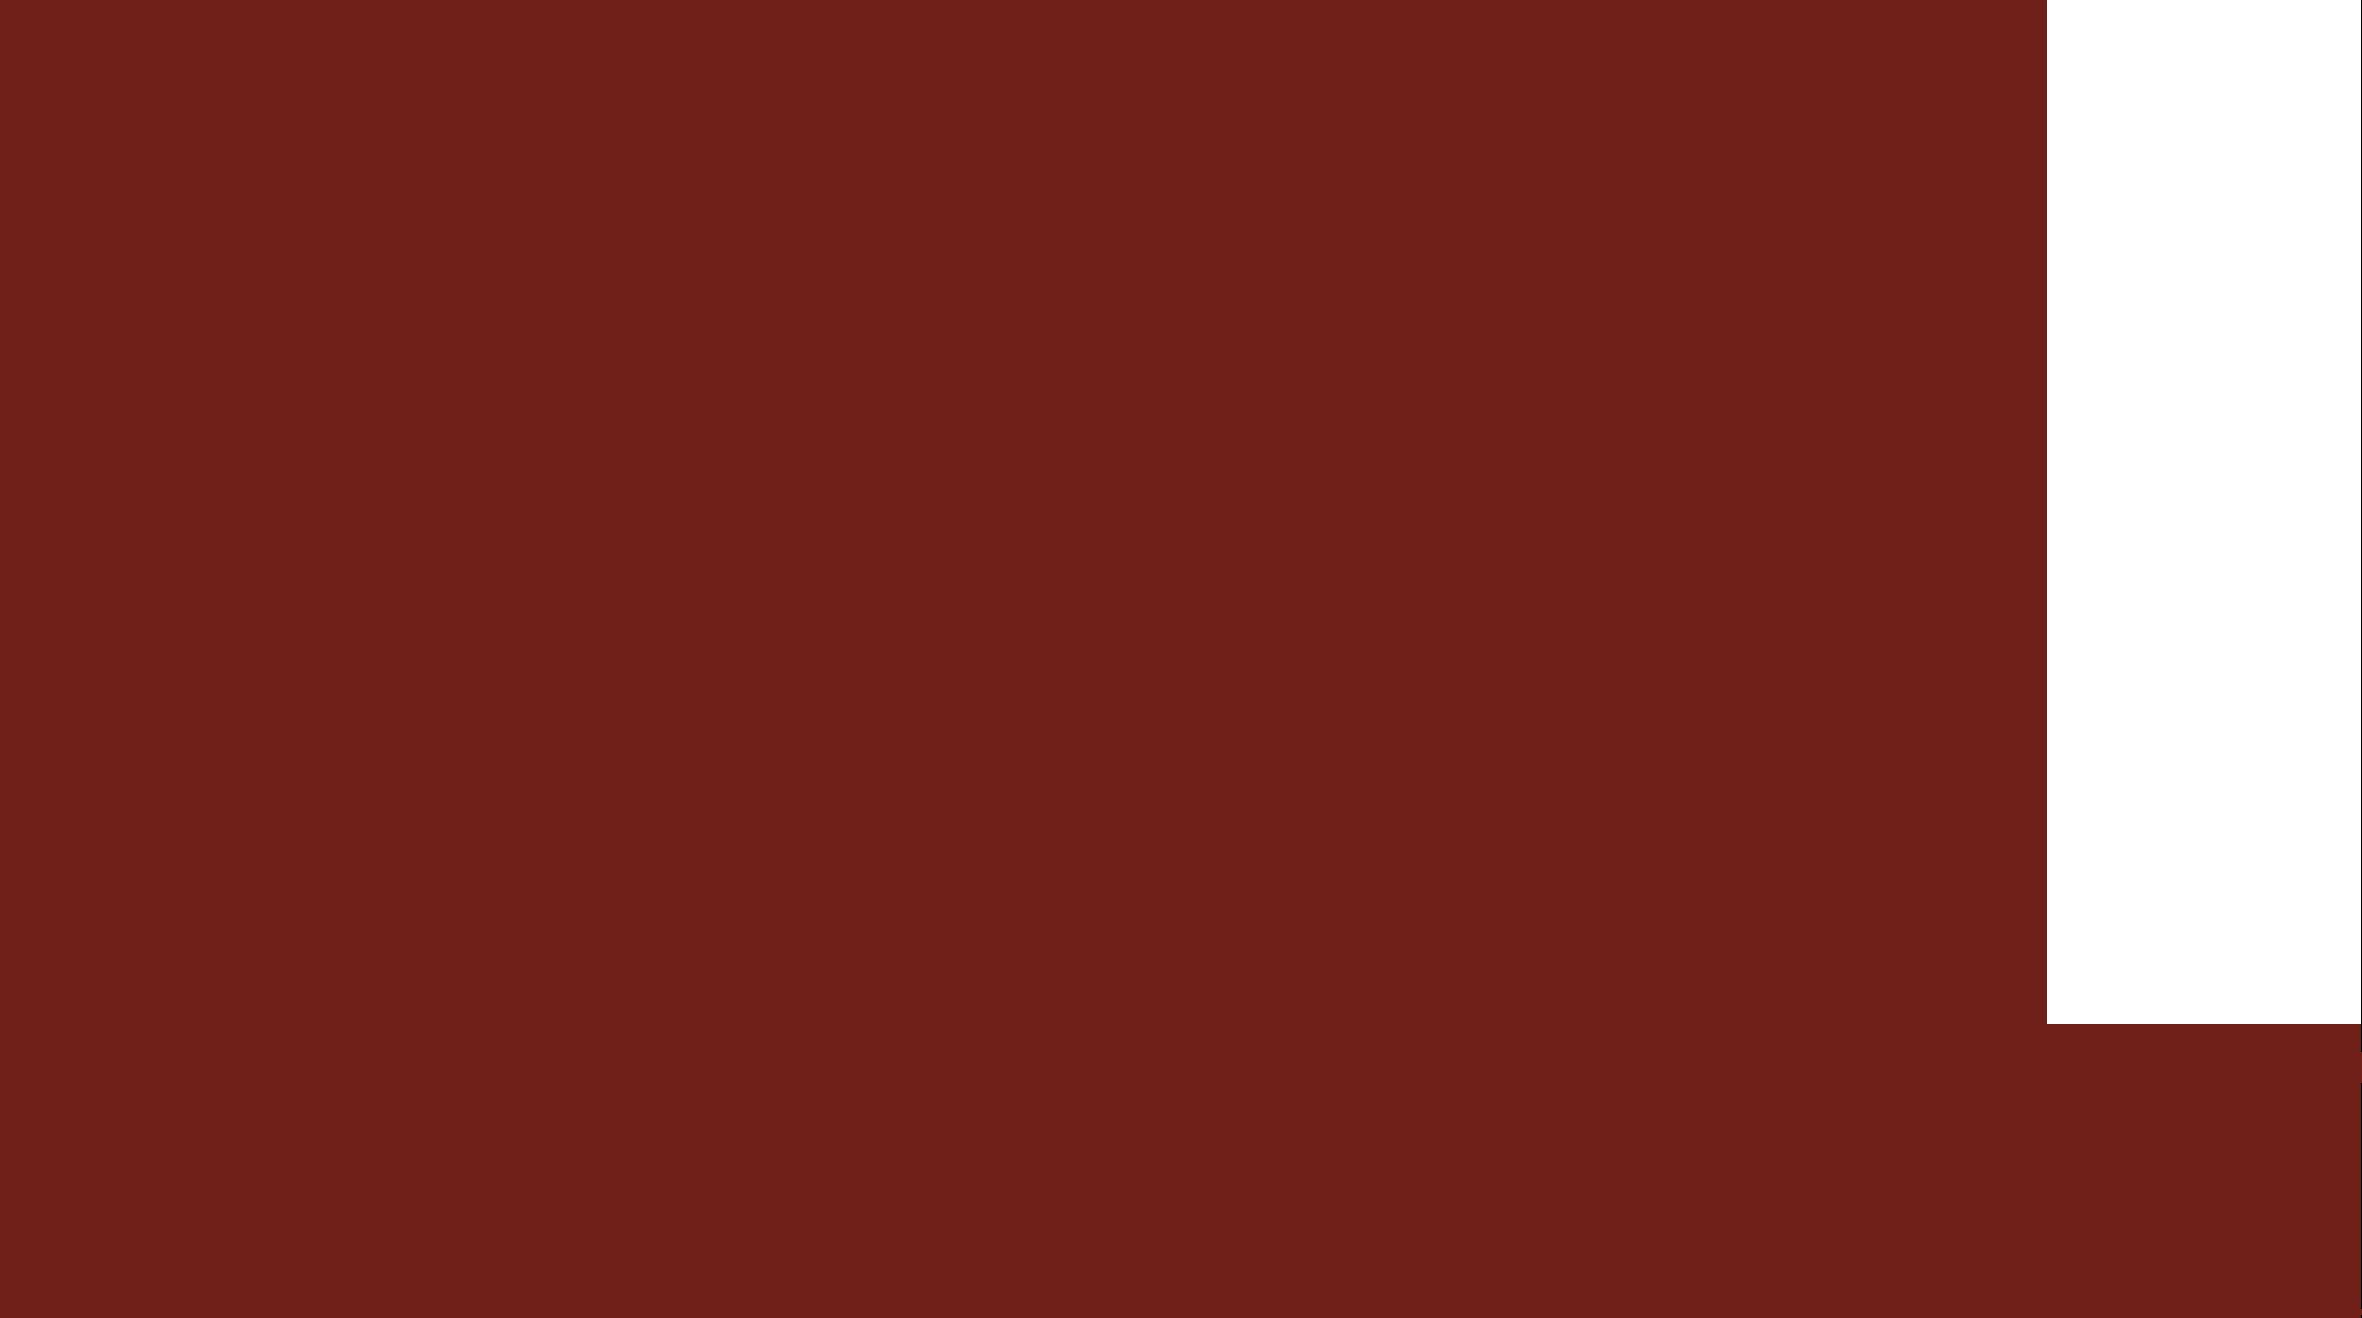 Tavantolgoi